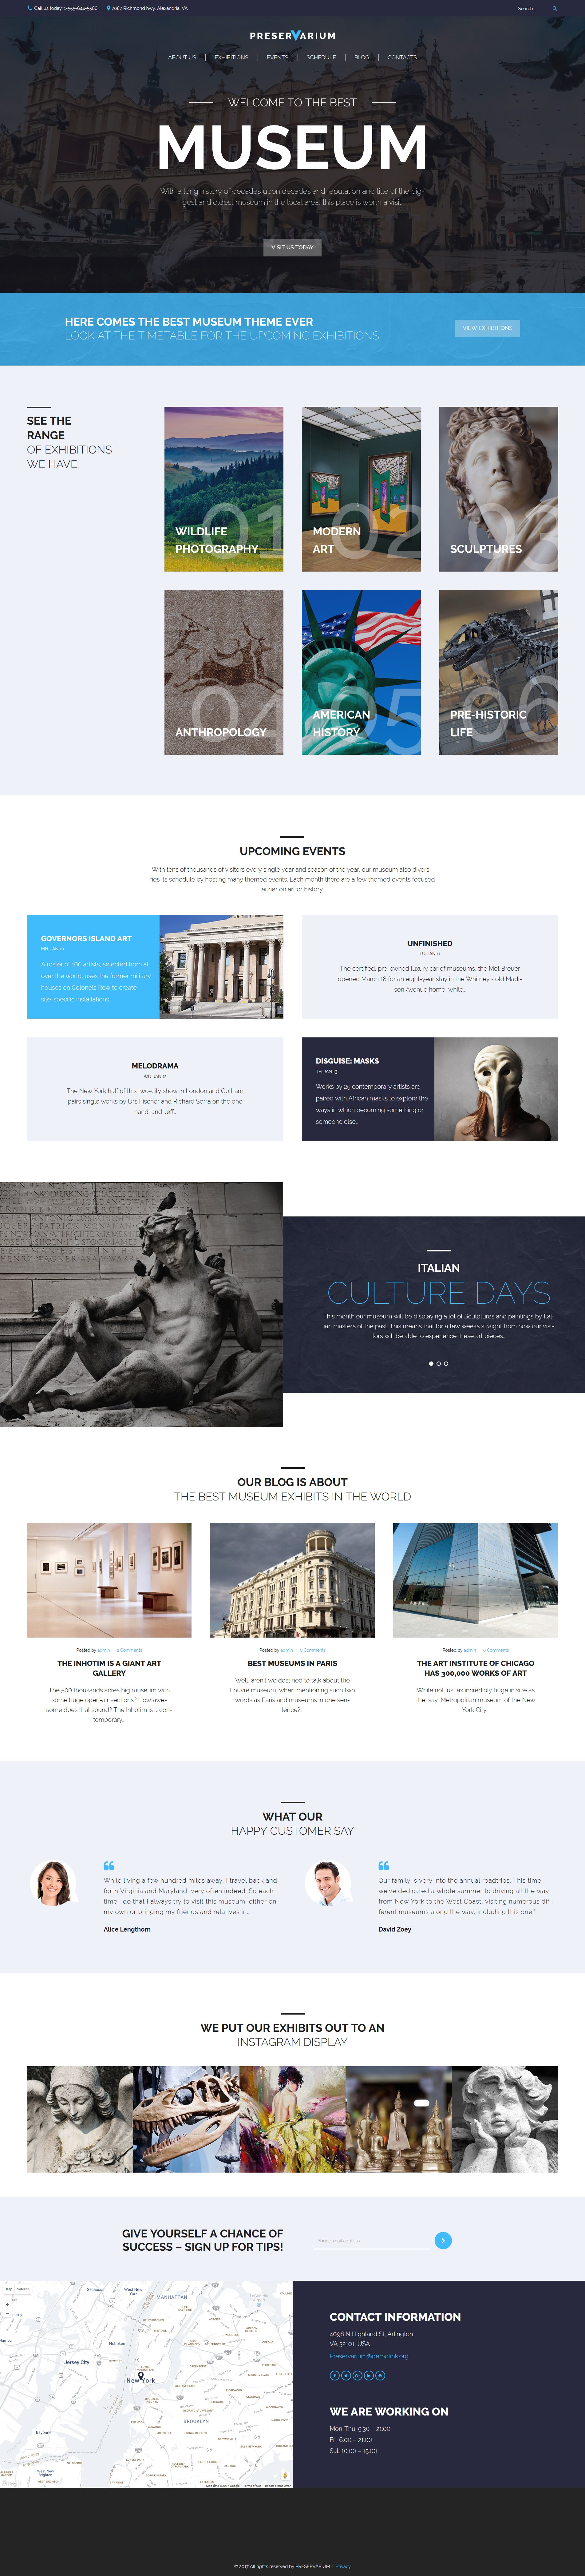 Preservarium - Museum Responsive WordPress Theme - screenshot